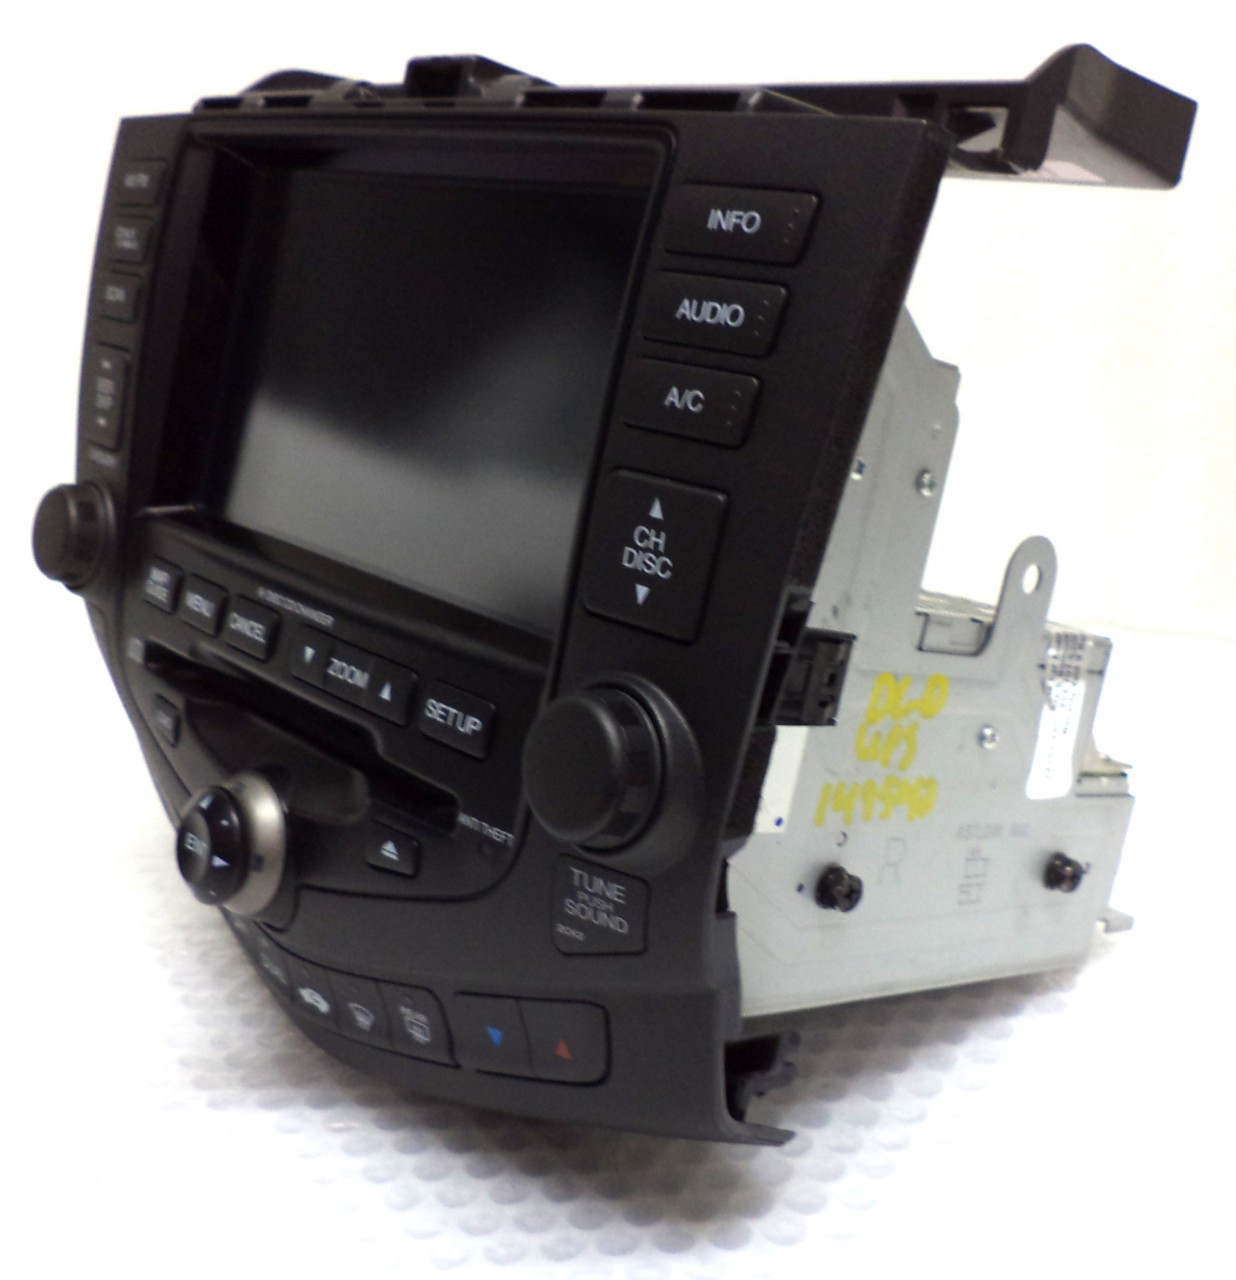 HONDA Accord Hybrid Navigation GPS System LCD Display Screen Monitor 6 Disc  Changer CD Player 2CK2 2005 39051-SDR-A410-M1 39175SDRA41 39183SDRA41ZA